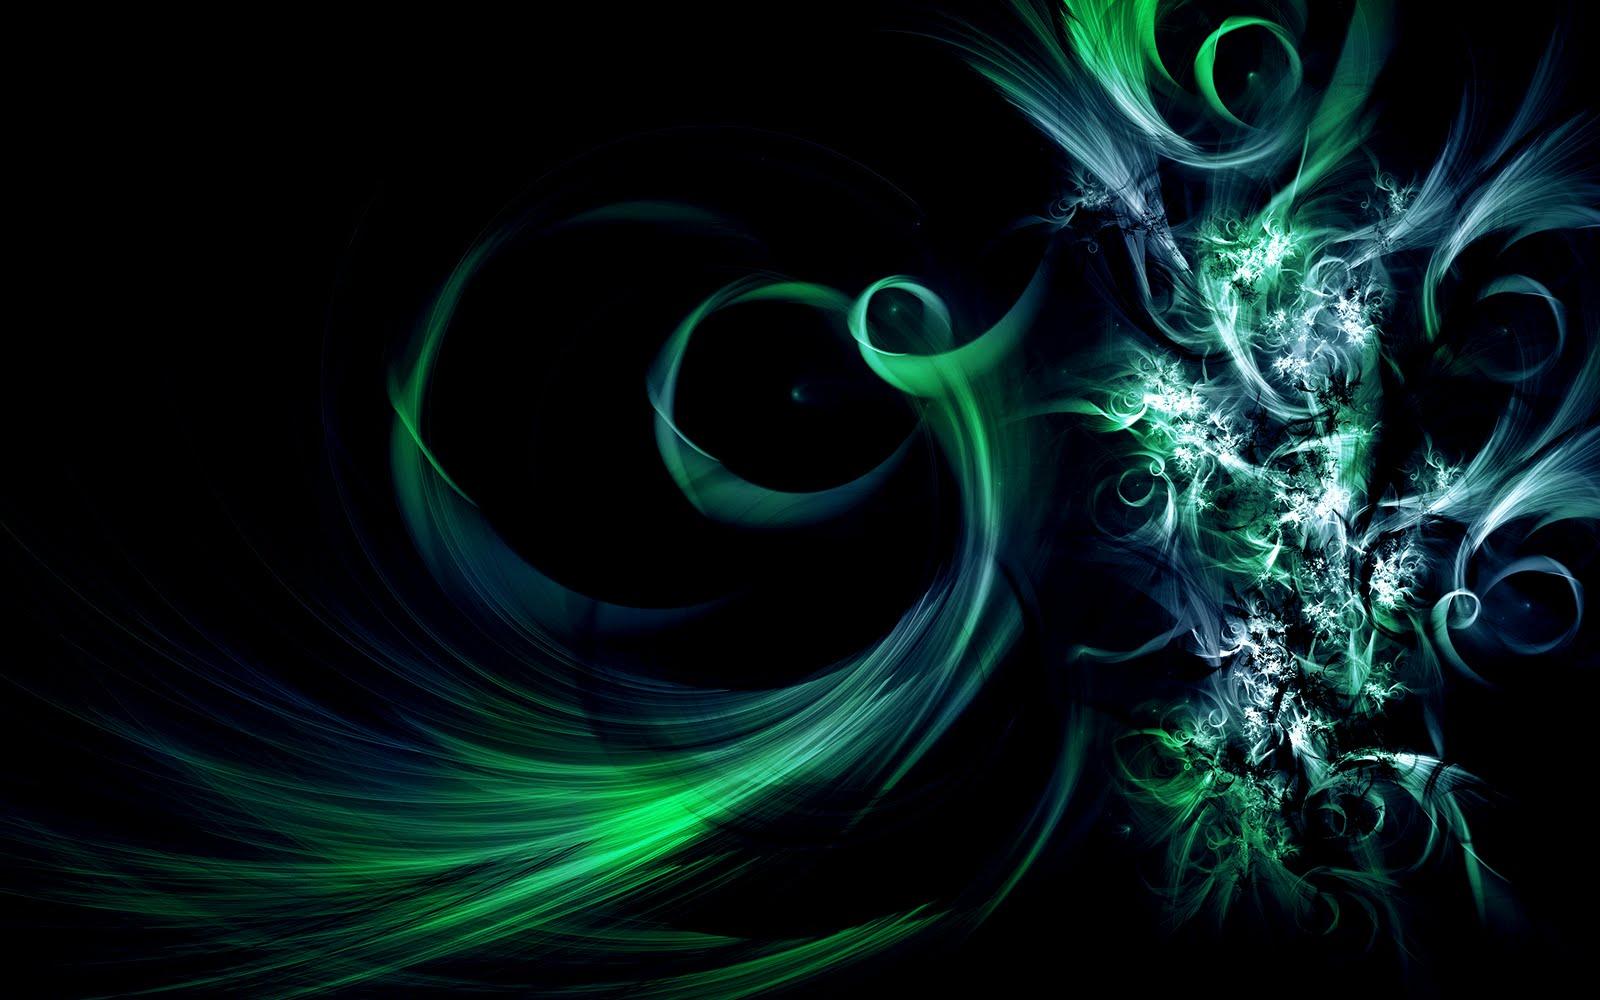 Imagini pt Desktop 3d Imagini Desktop Abstract